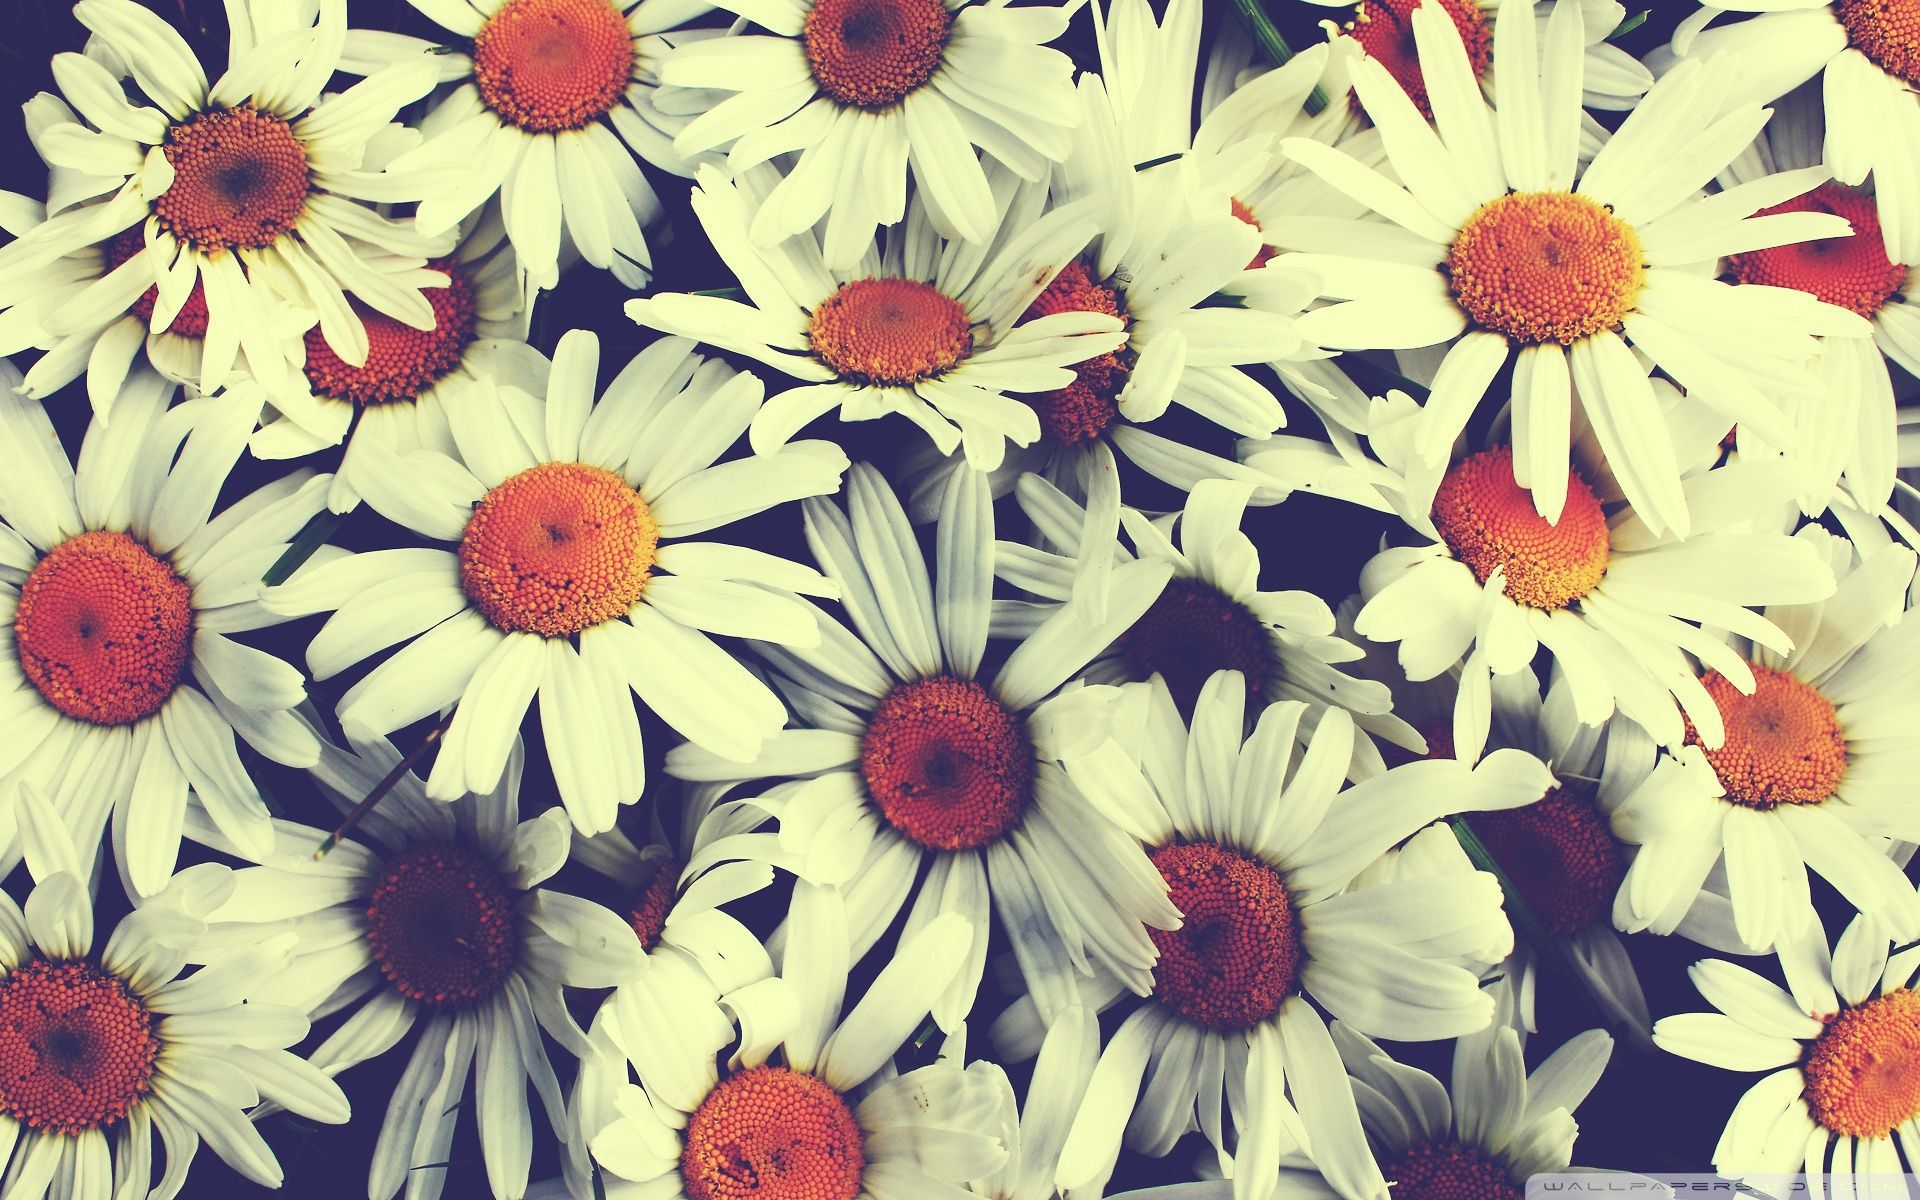 60+] Flower Computer Backgrounds on WallpaperSafari